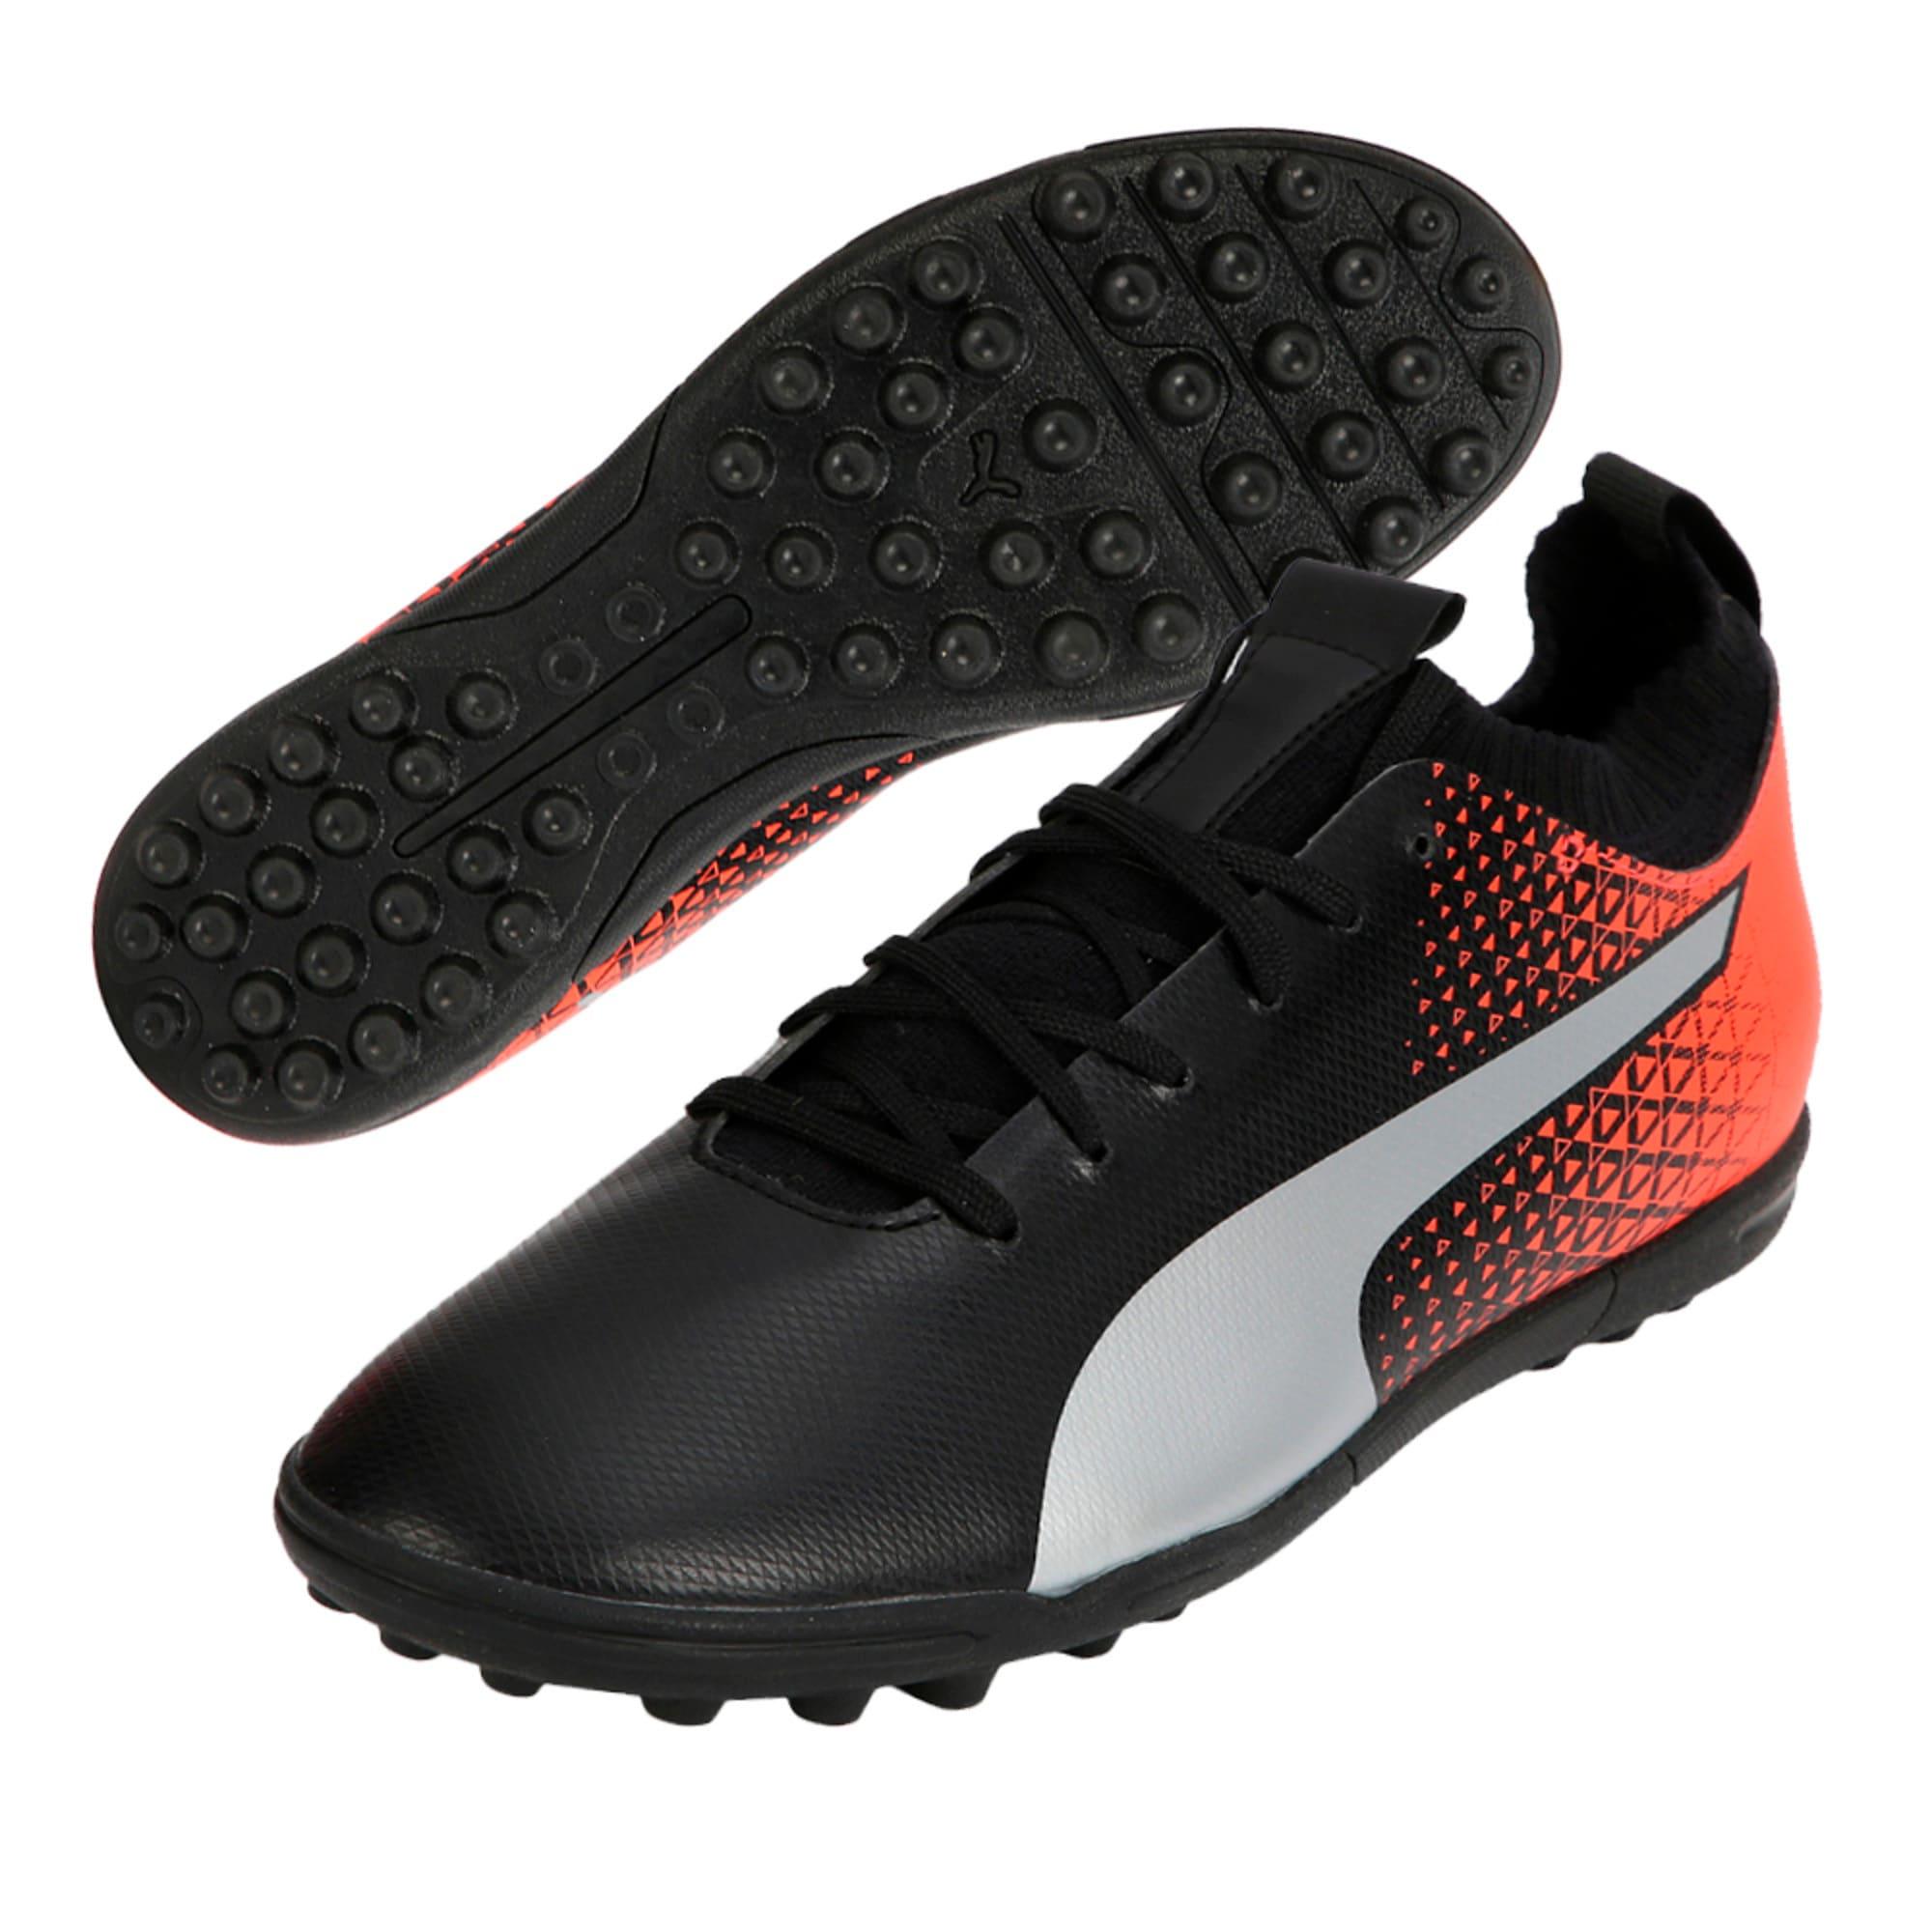 Thumbnail 6 of evoKNIT TT Men's Football Shoes, Black-Silver-Red, medium-IND